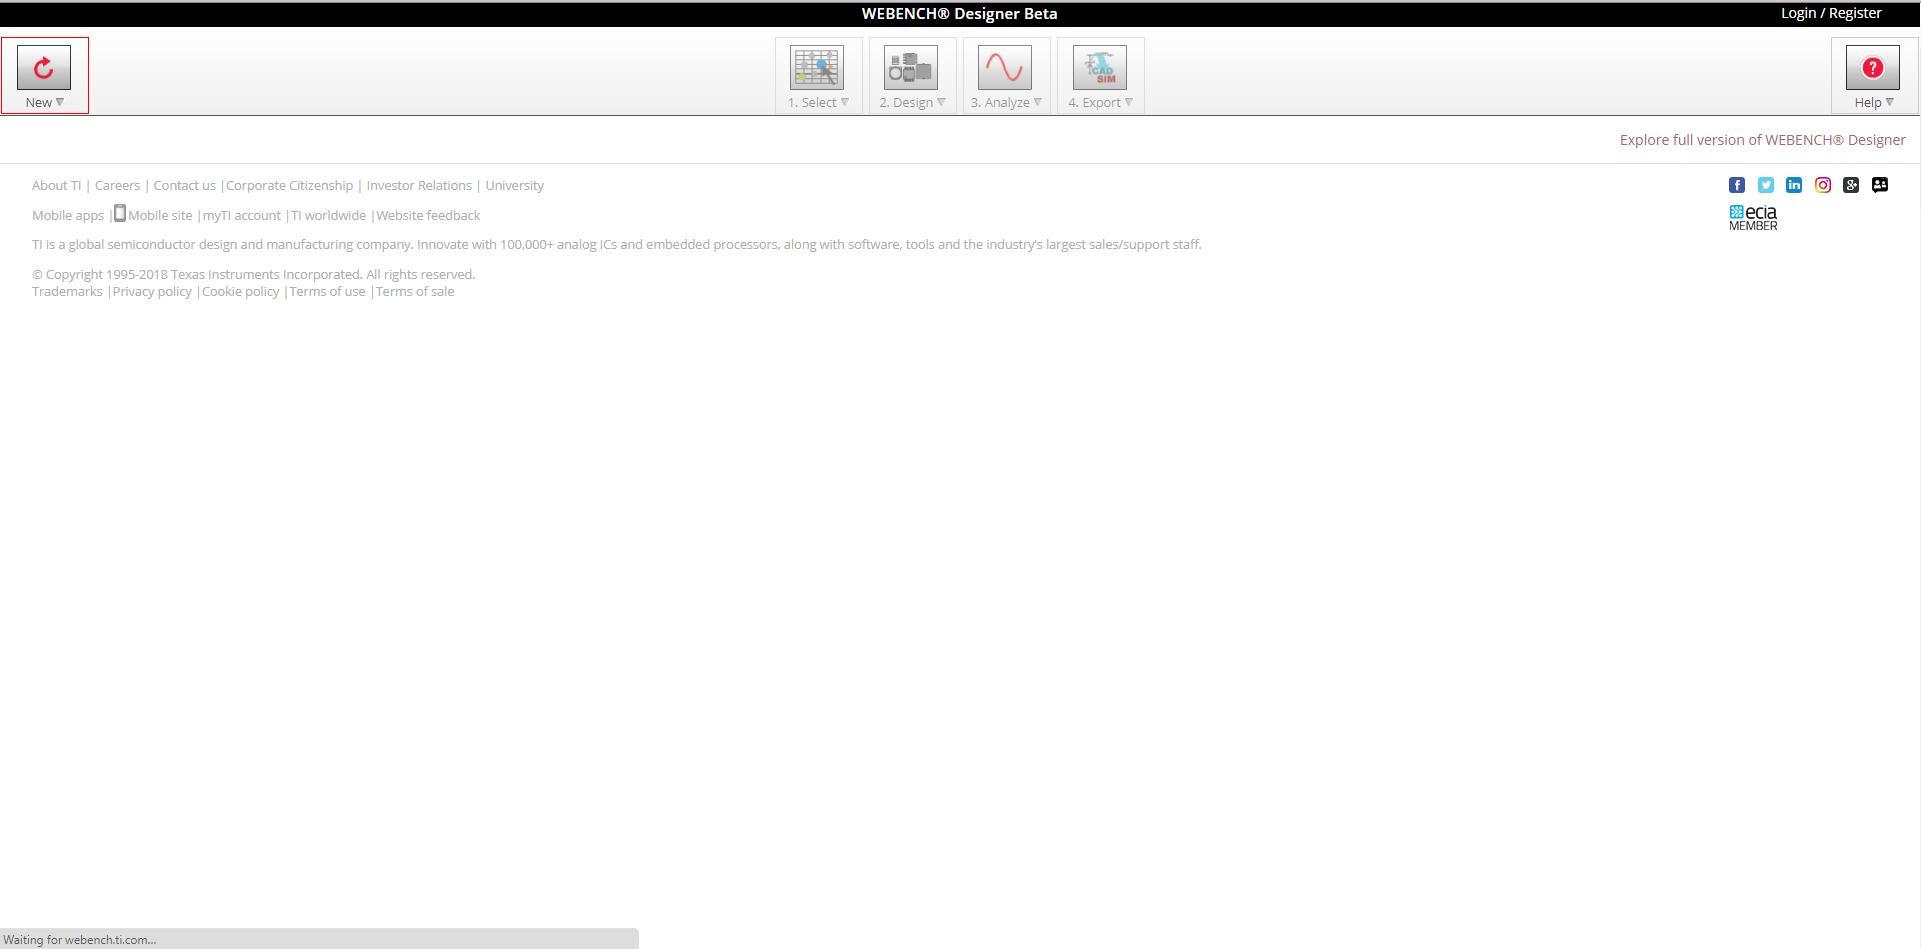 Resolved] WEBENCH® Tools: iPad WEBENCH Error - Simulation